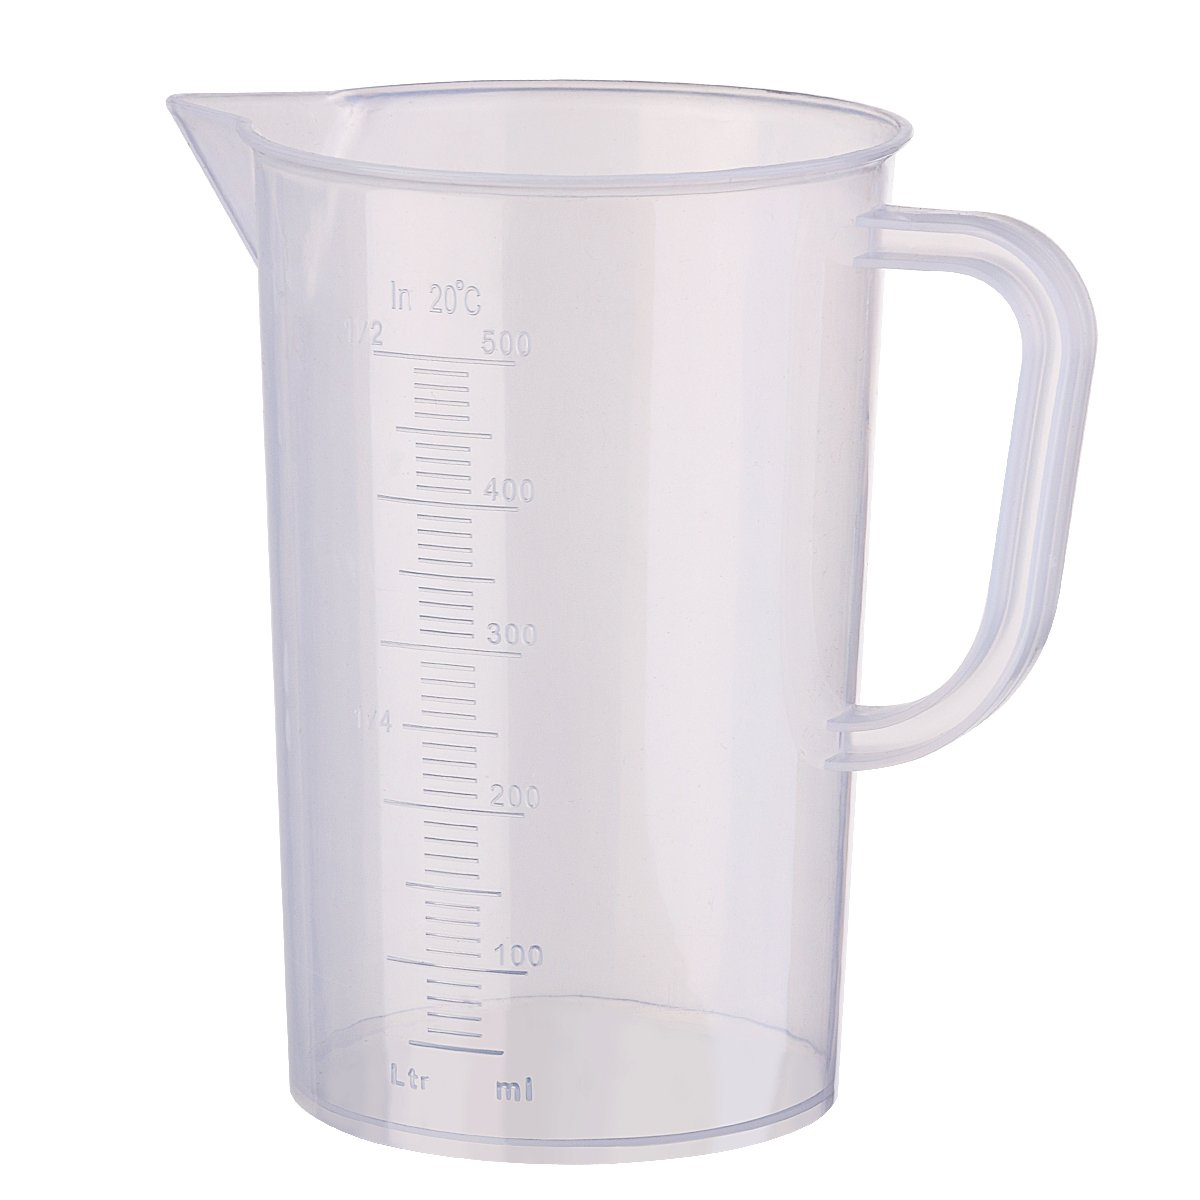 UEETEK 500ML Measuring Cup Plastic Sacle Graduated Cup Measurement Beaker